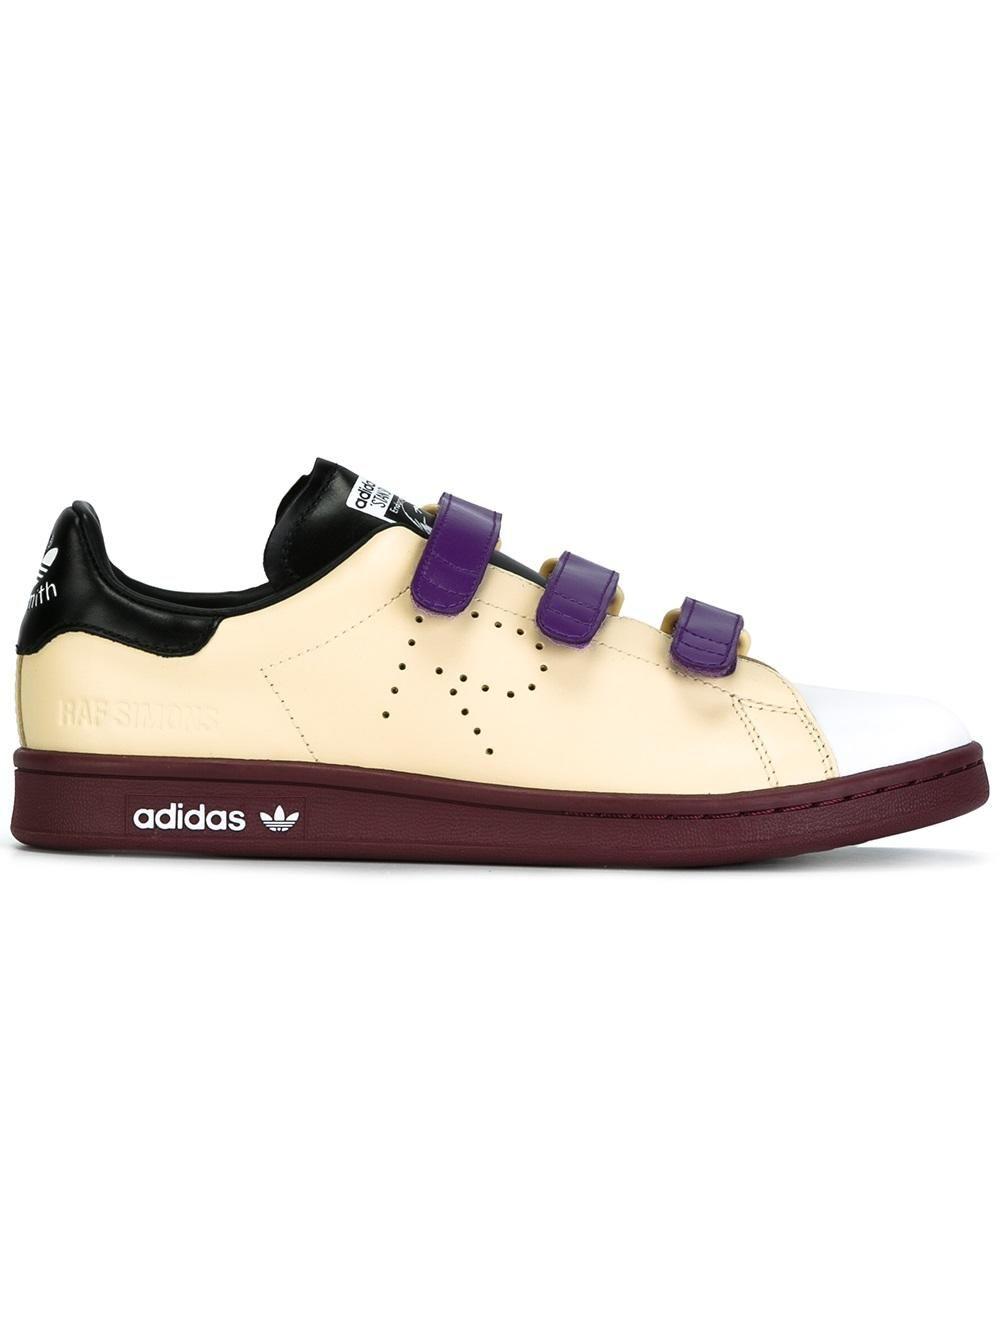 Zapatillas Stan Smith Adidas By Raf Simons Zapatos Mujer